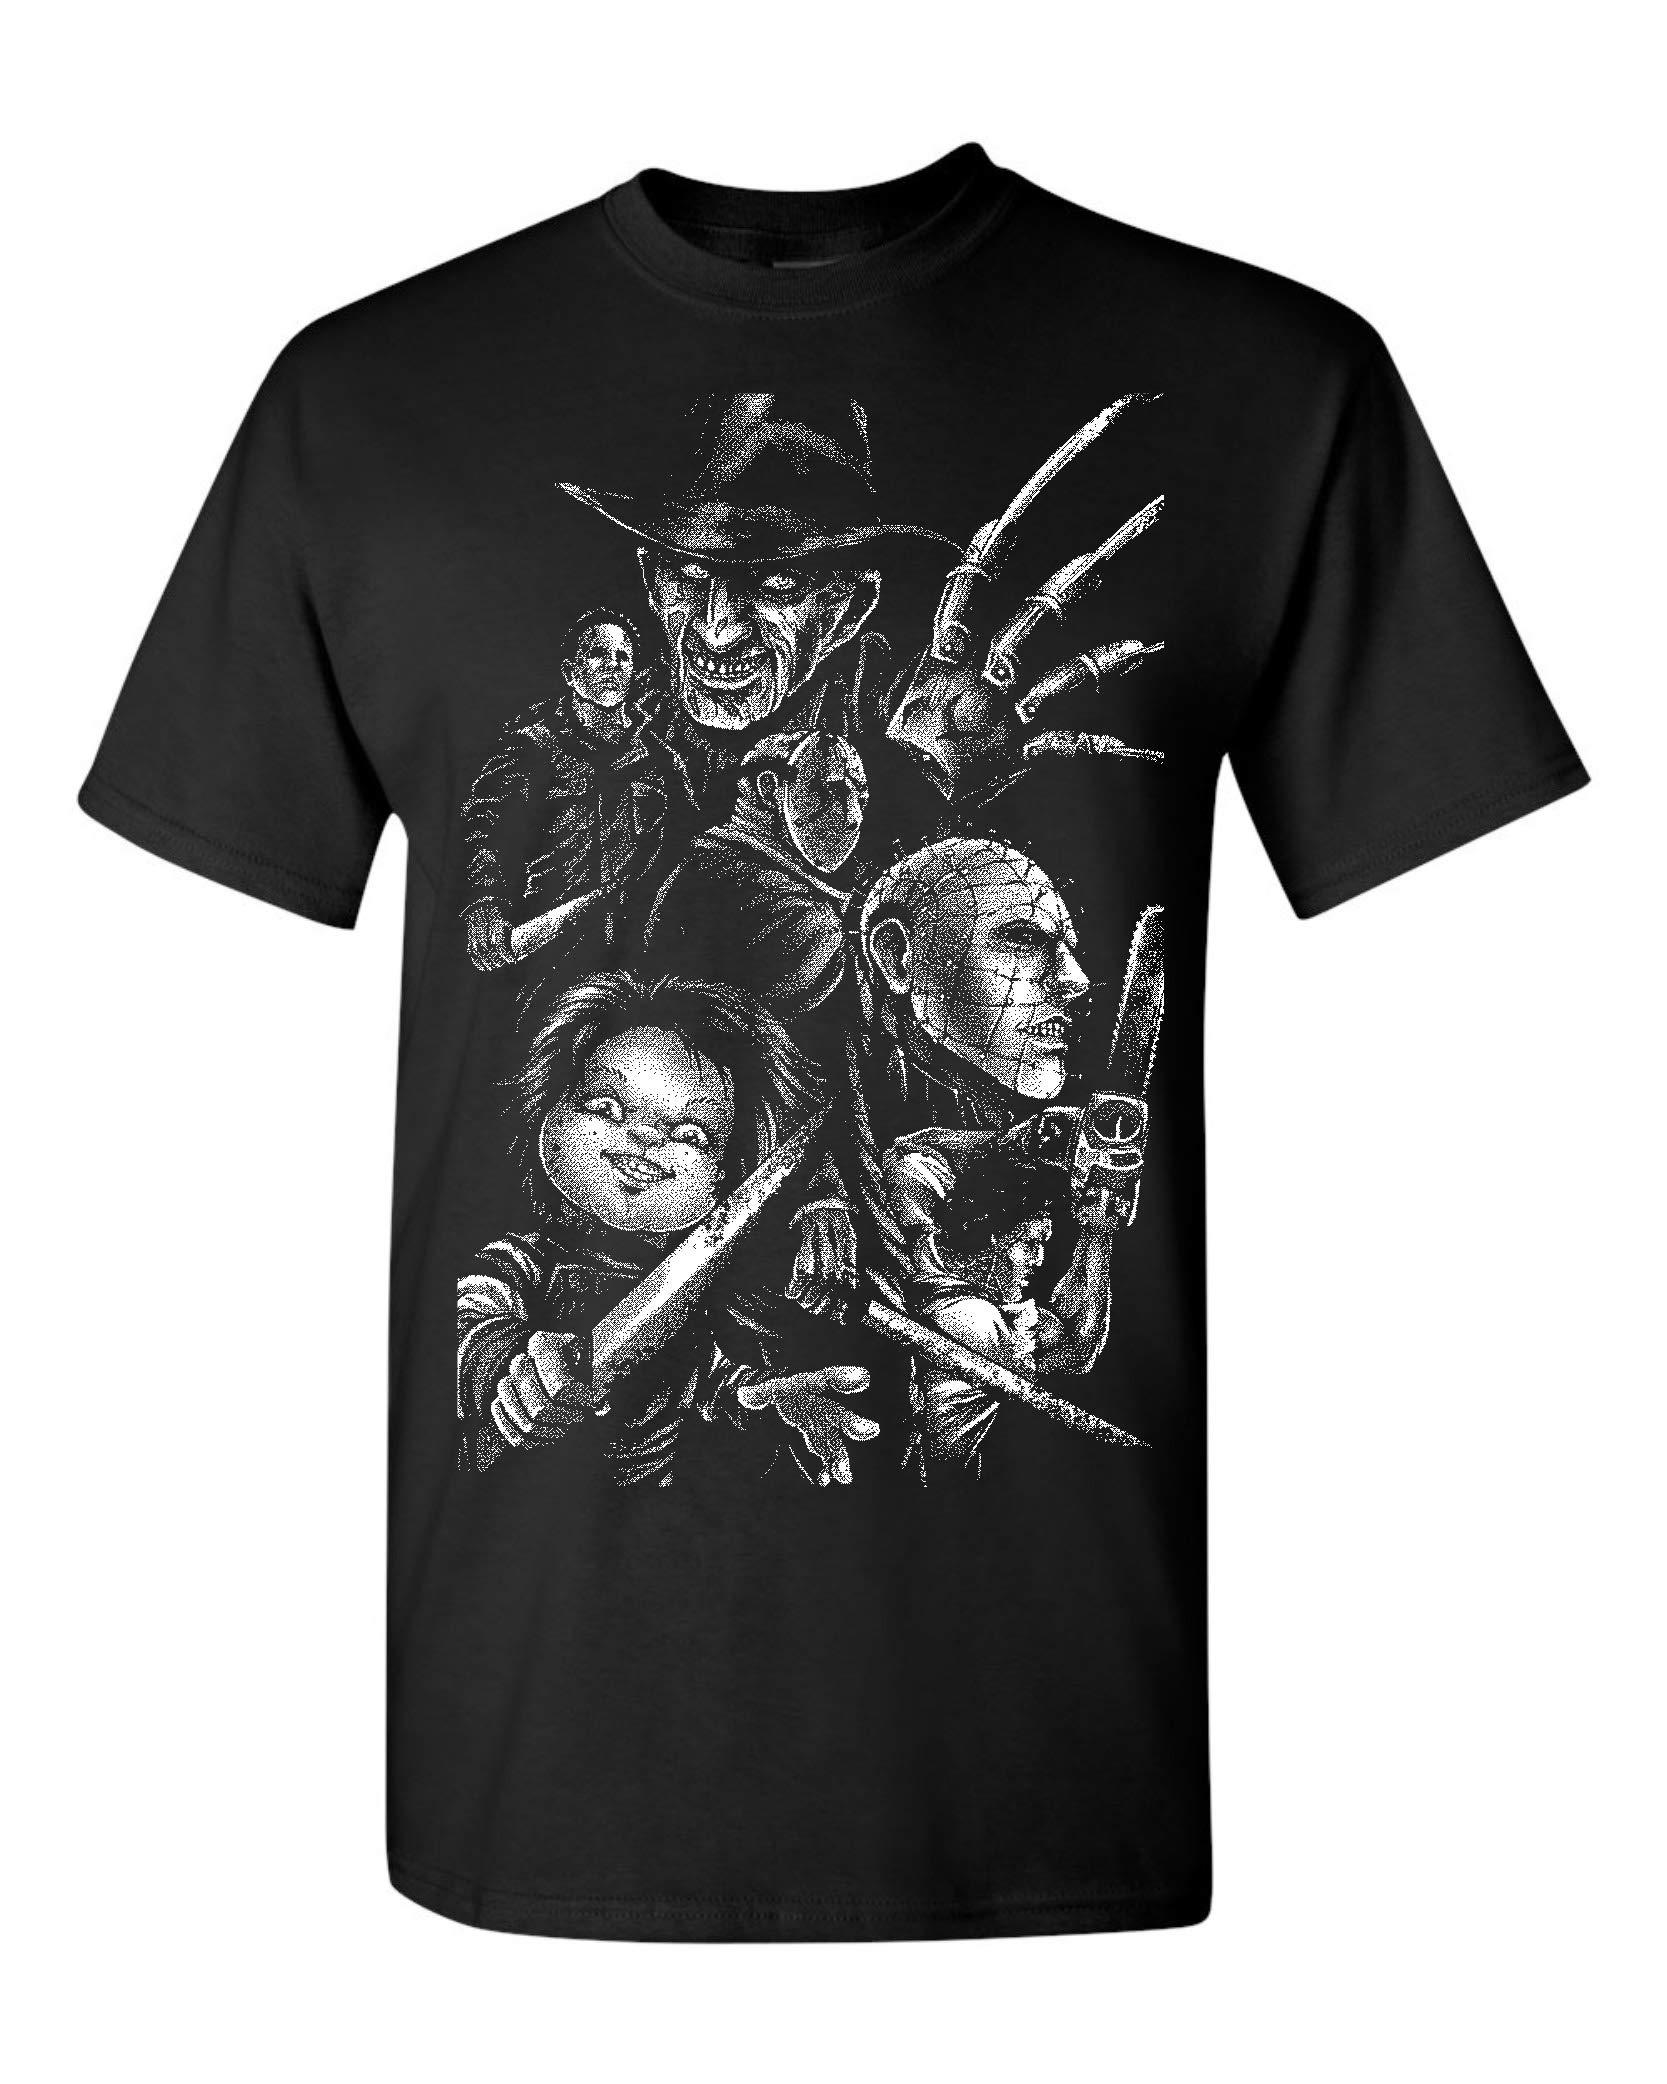 Classic Horror Movie Images S Tshirt